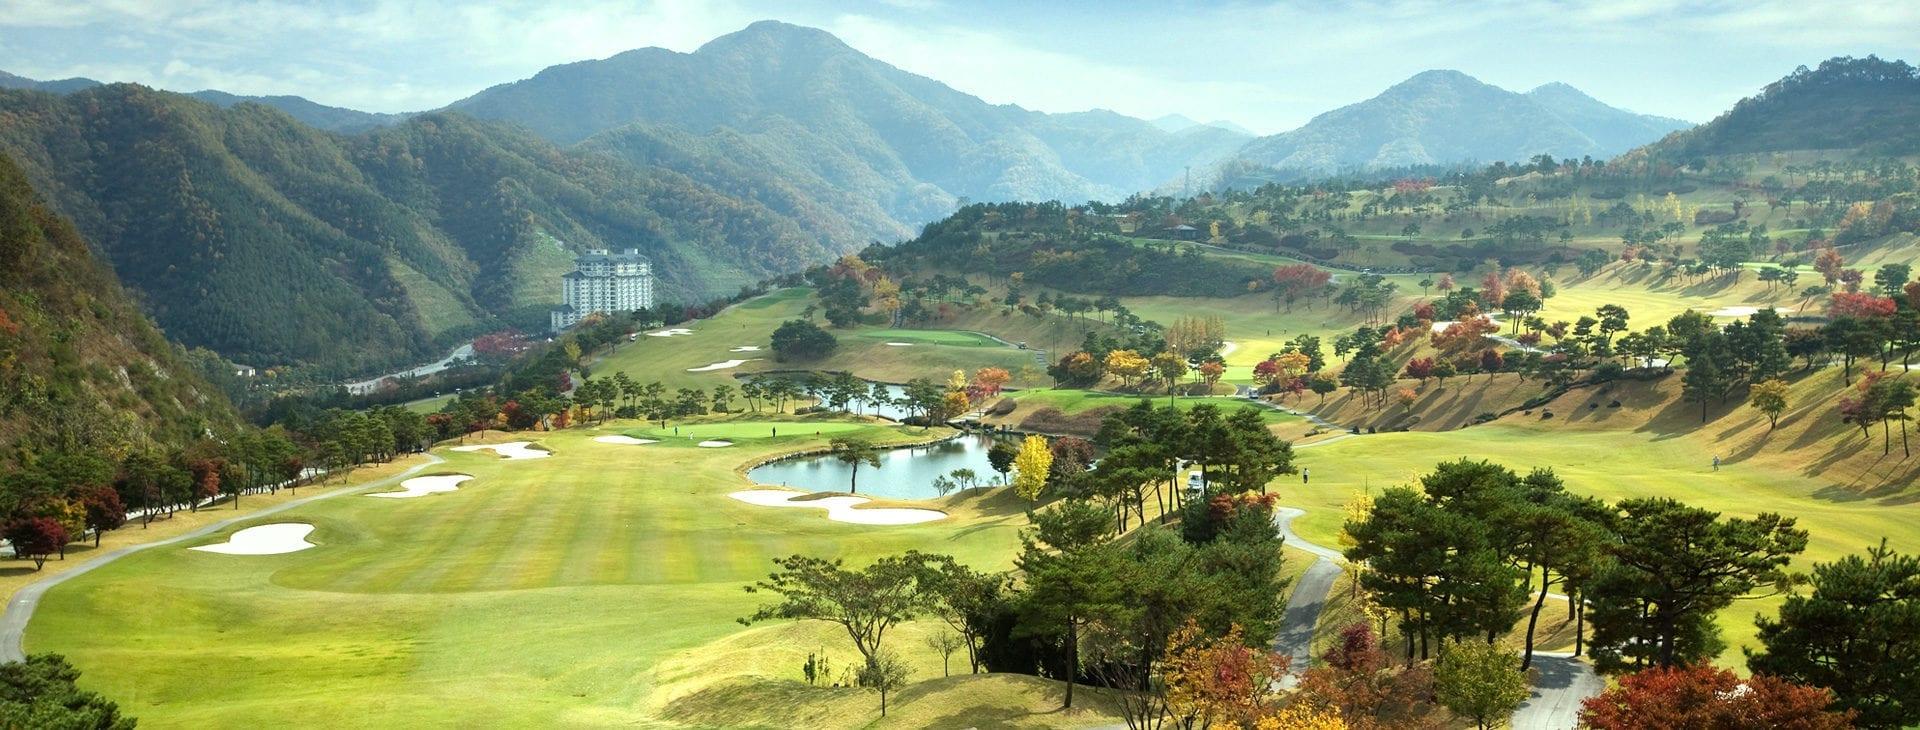 Elysian Gangchon Resort   Chuncheon, Gangwon-do